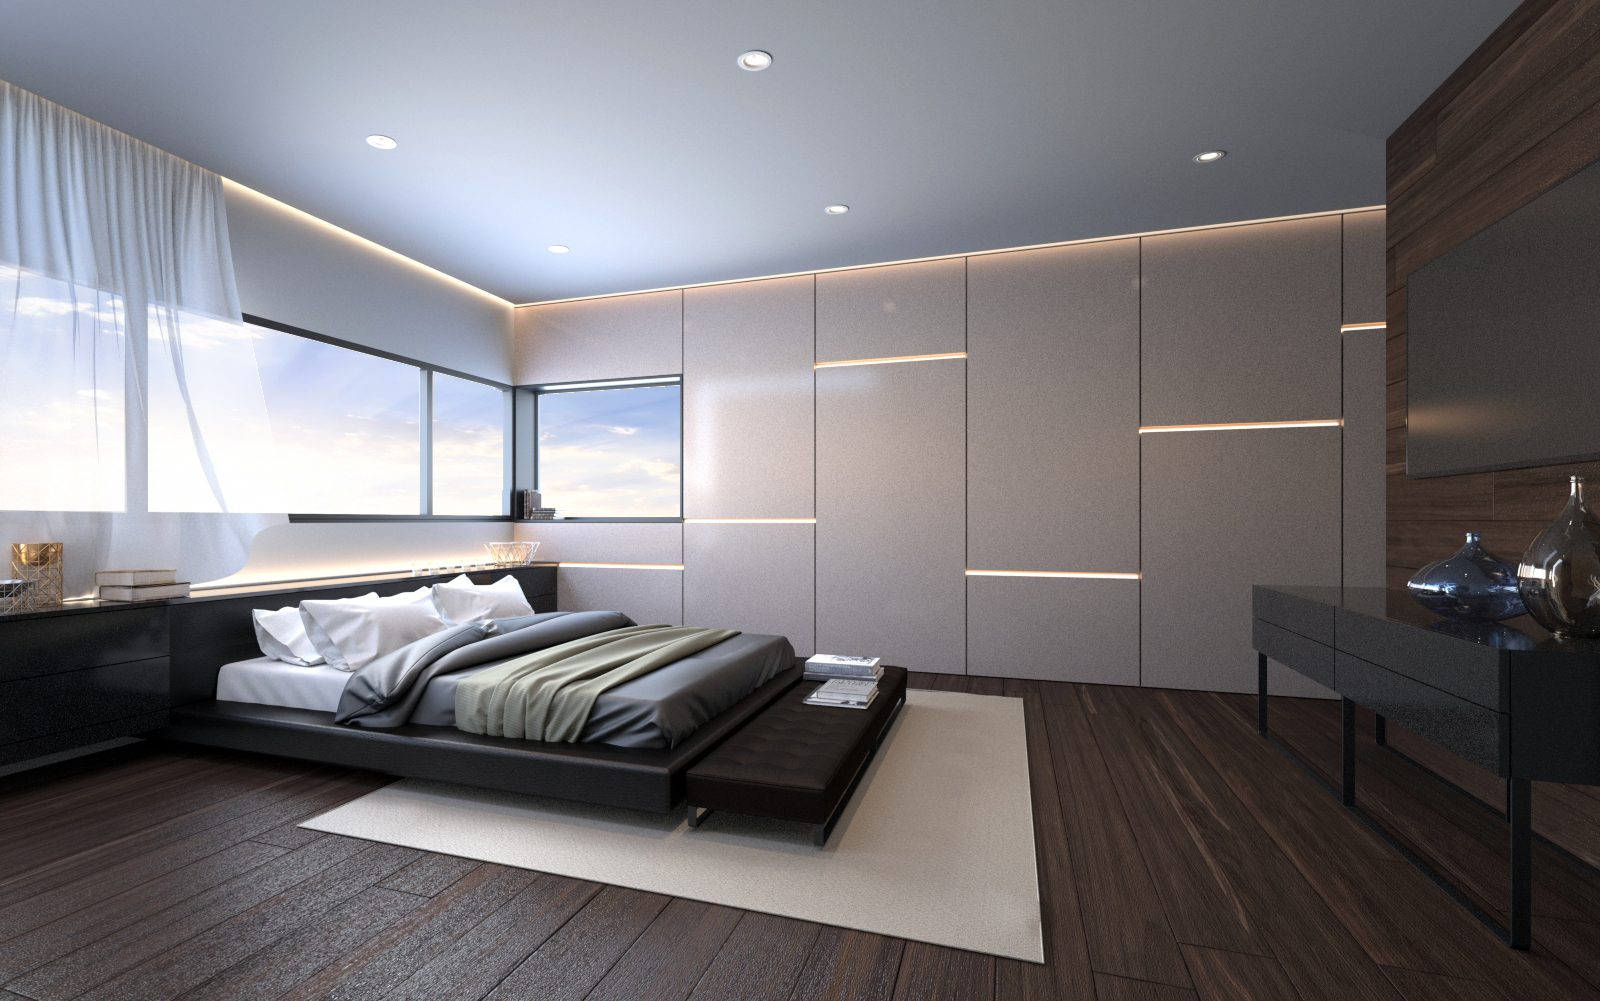 Bedroom Penthouse Interior